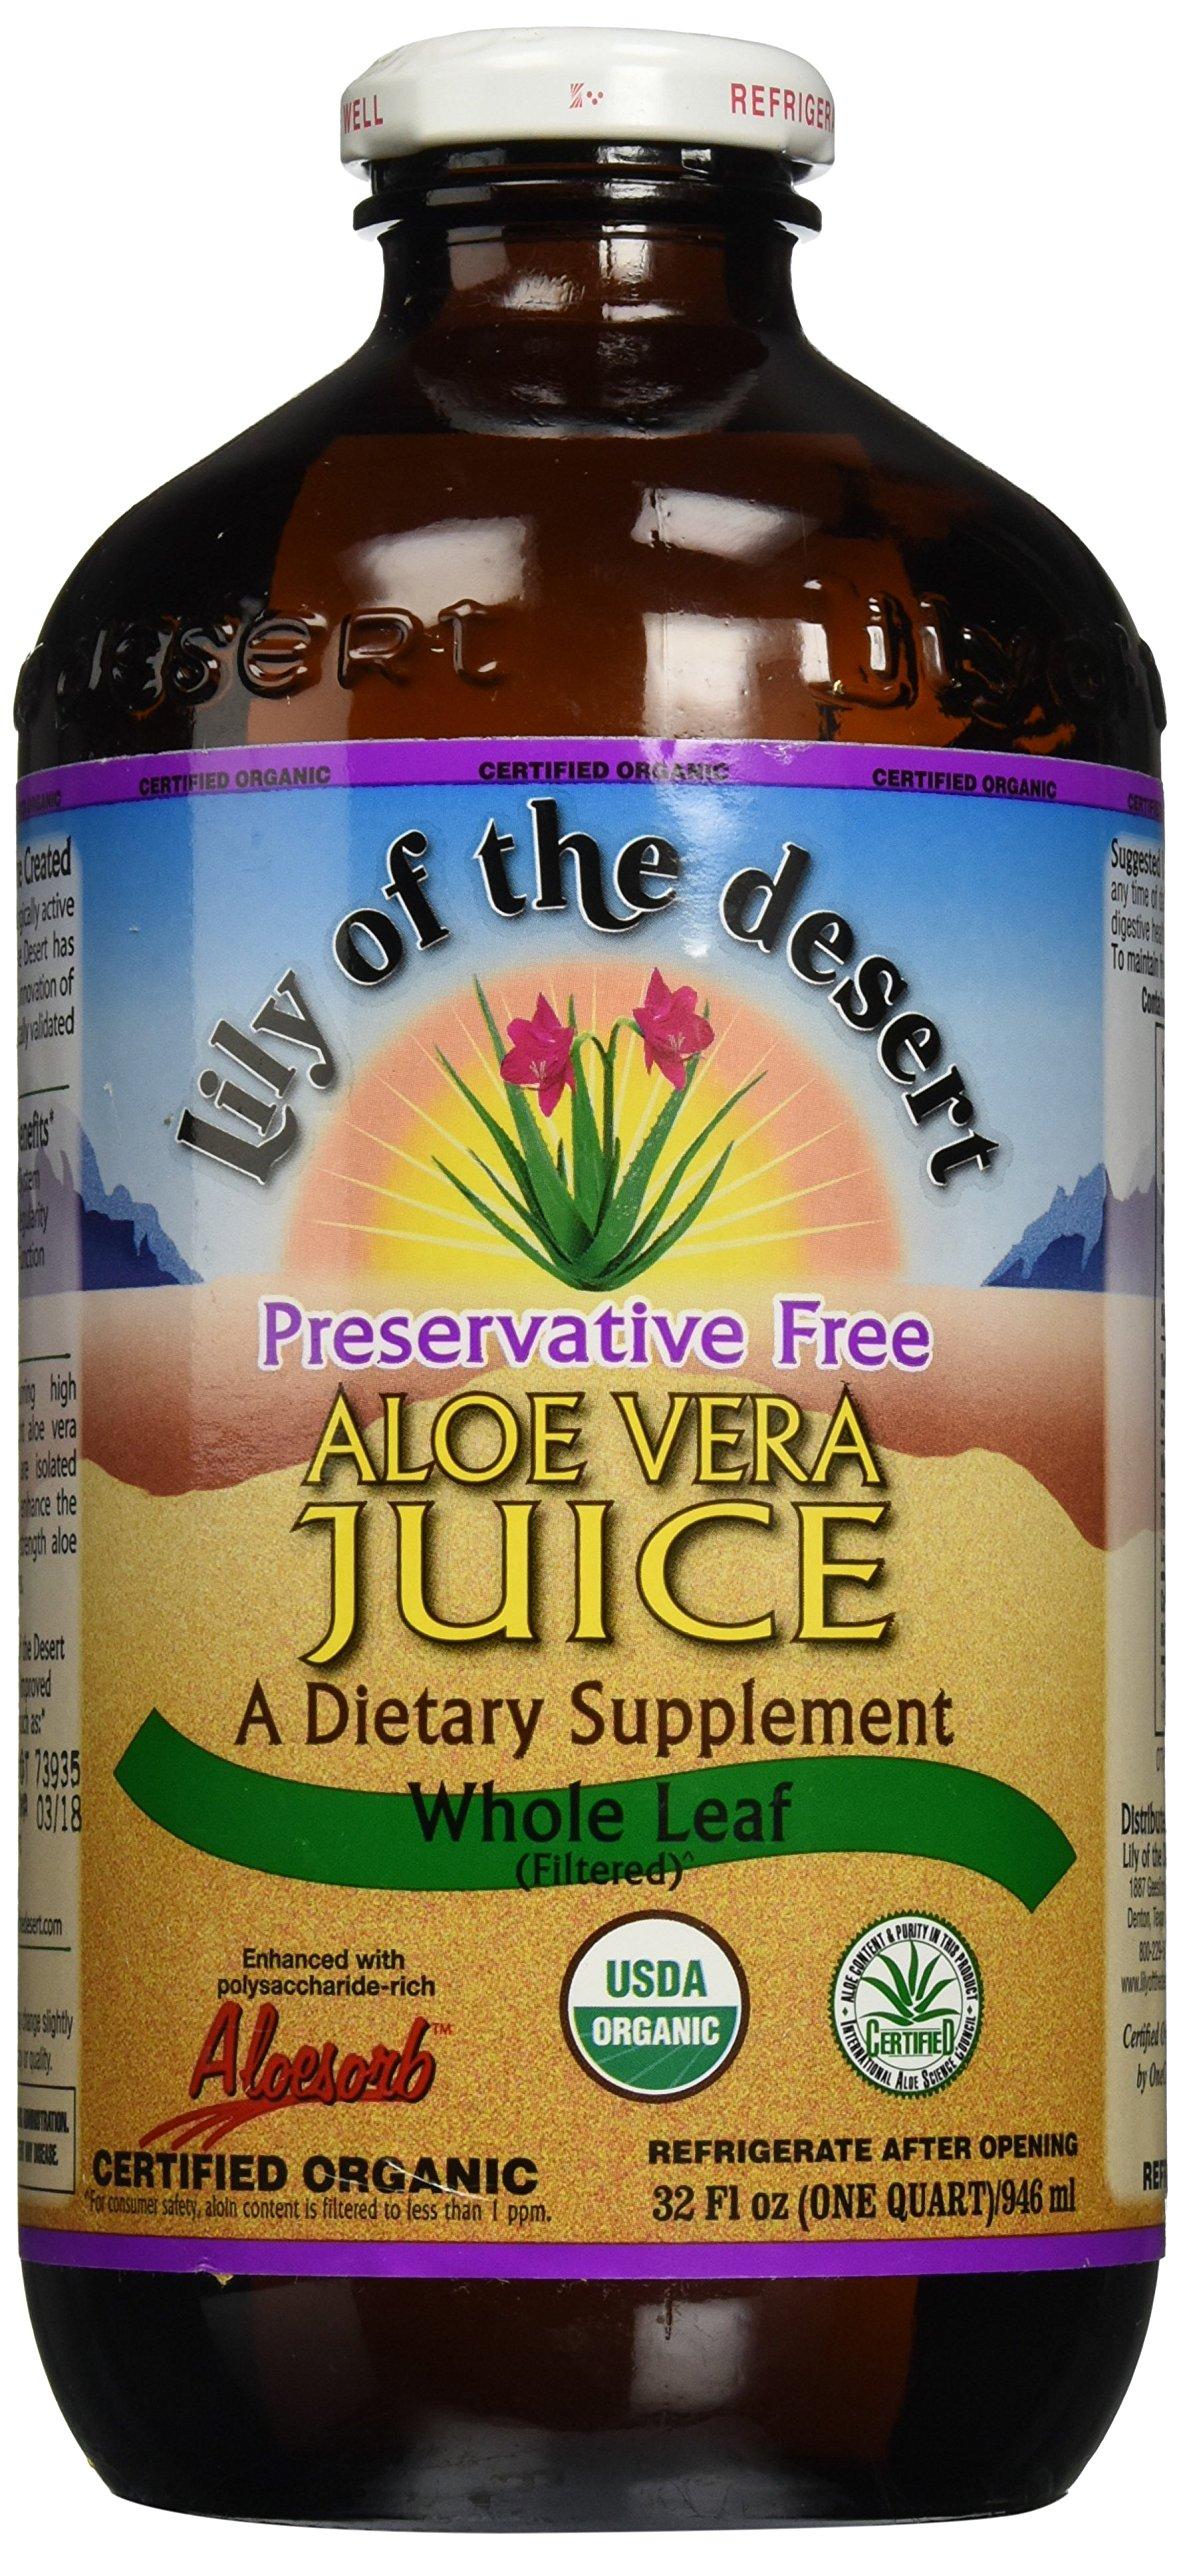 Lily Of The Desert Juice Aloe Vera Pf Whl Lea (32 ounces) (1)